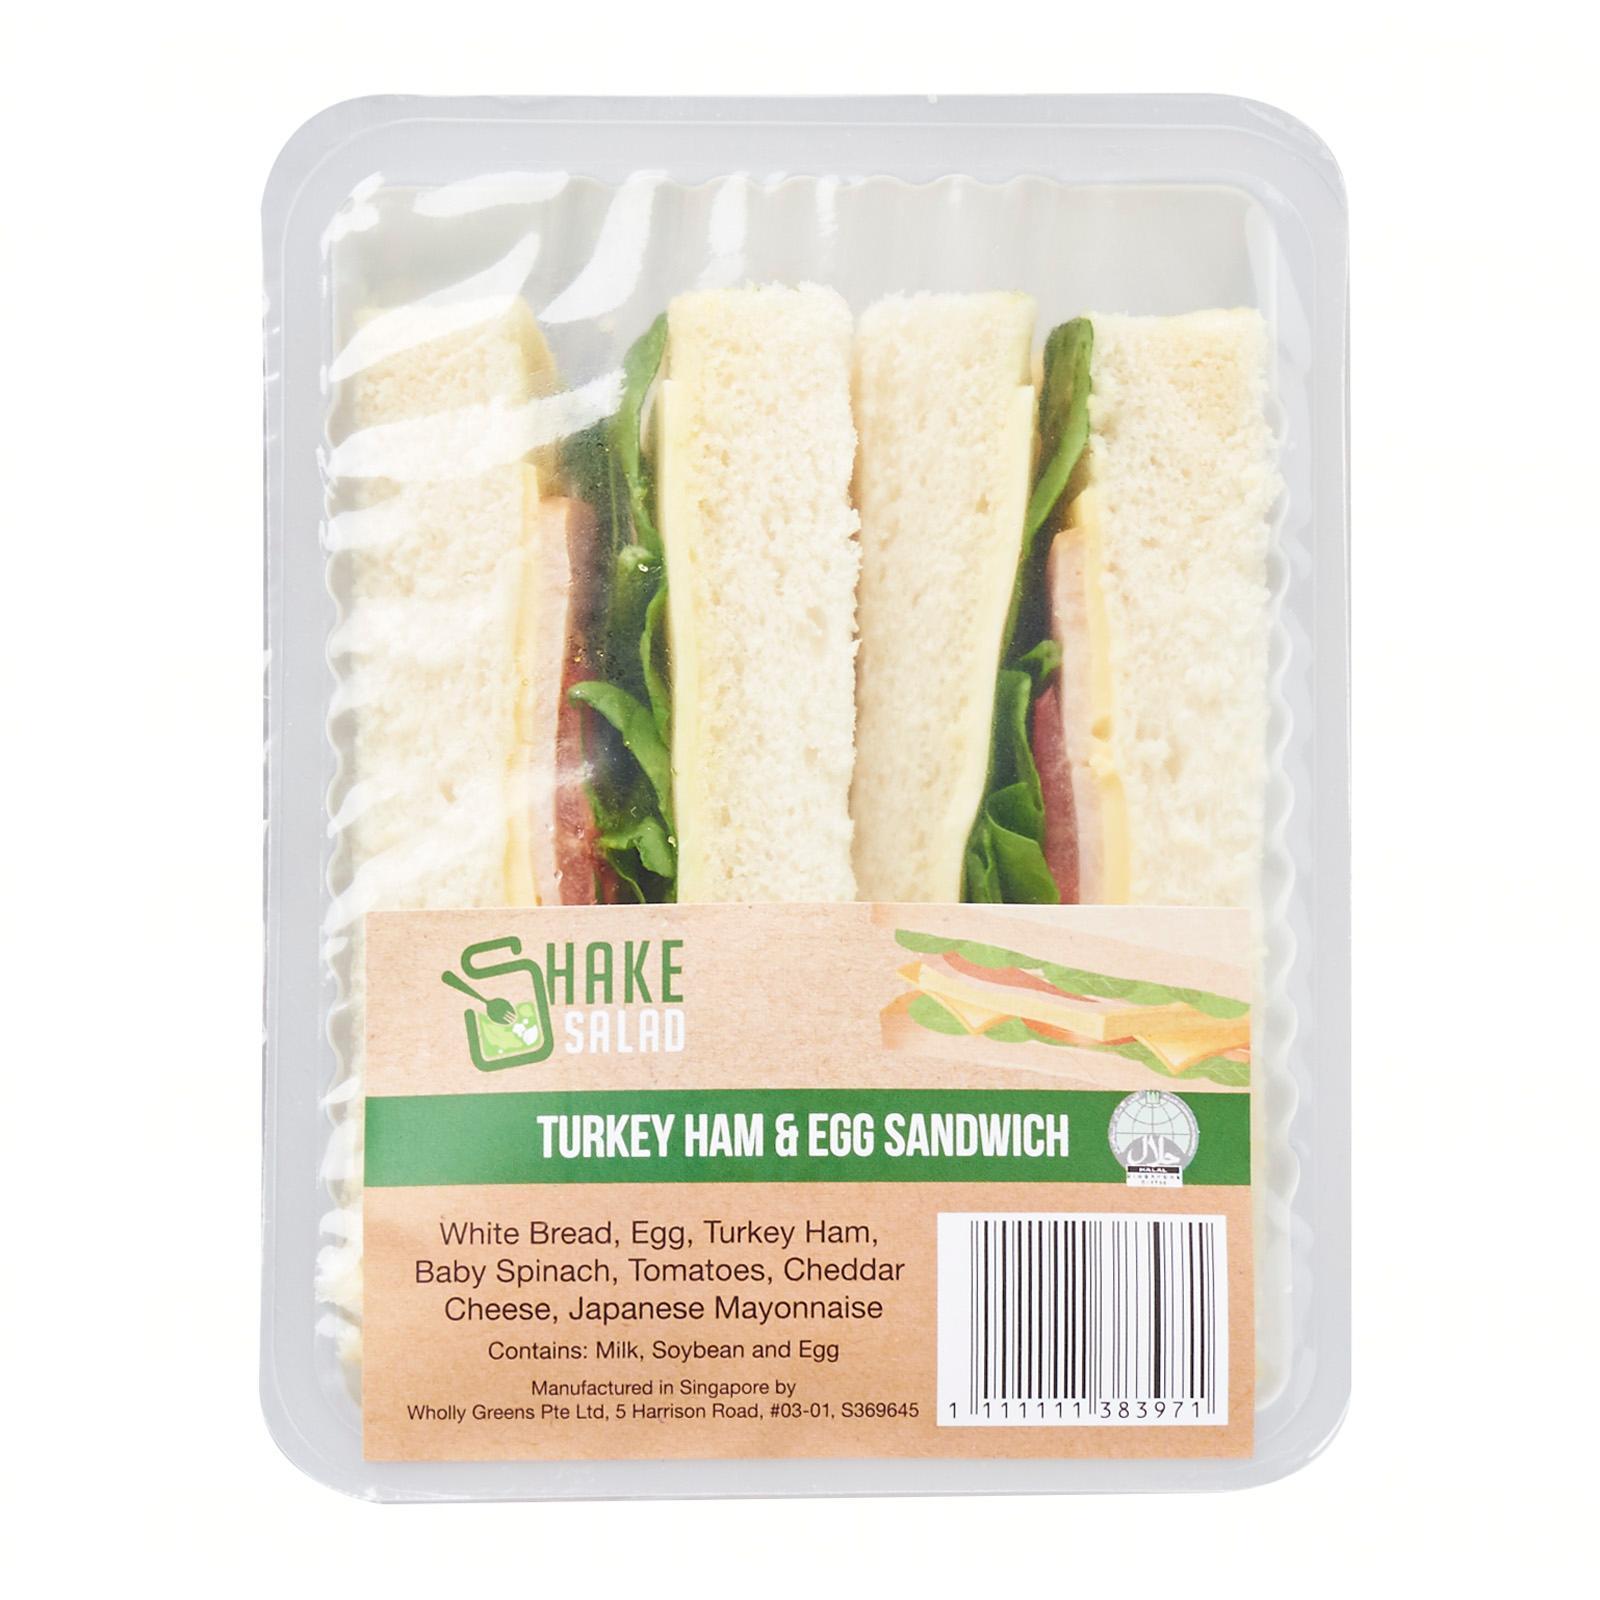 Shake Salad Turkey Ham and Egg Sandwich